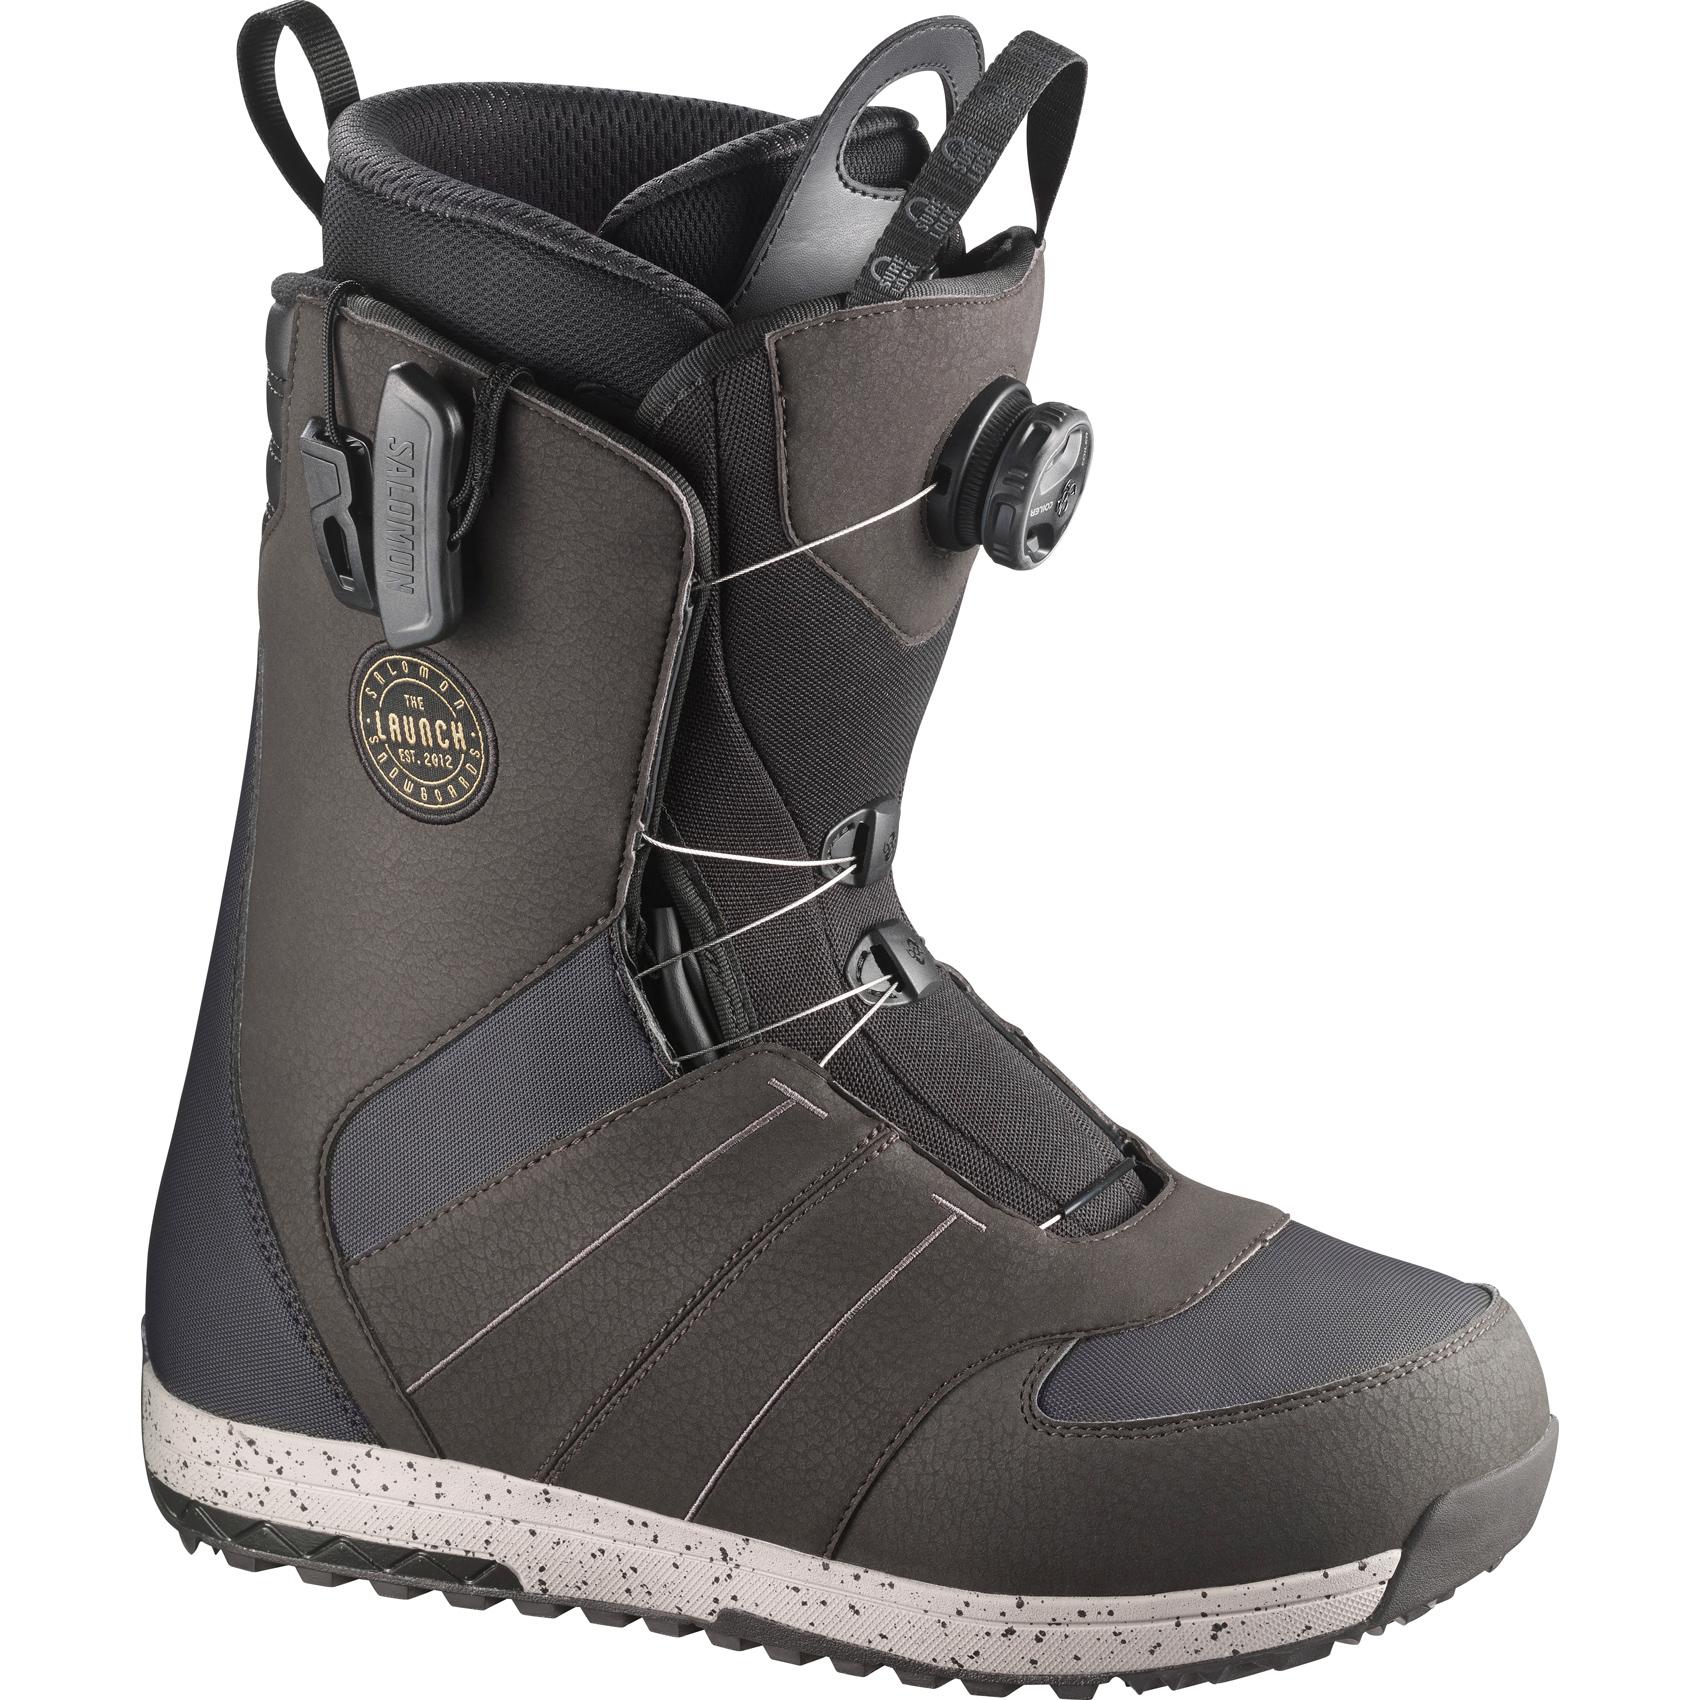 Salomon Launch BOA STR8JKT Mens Snowboard Boots UK 7.5 review